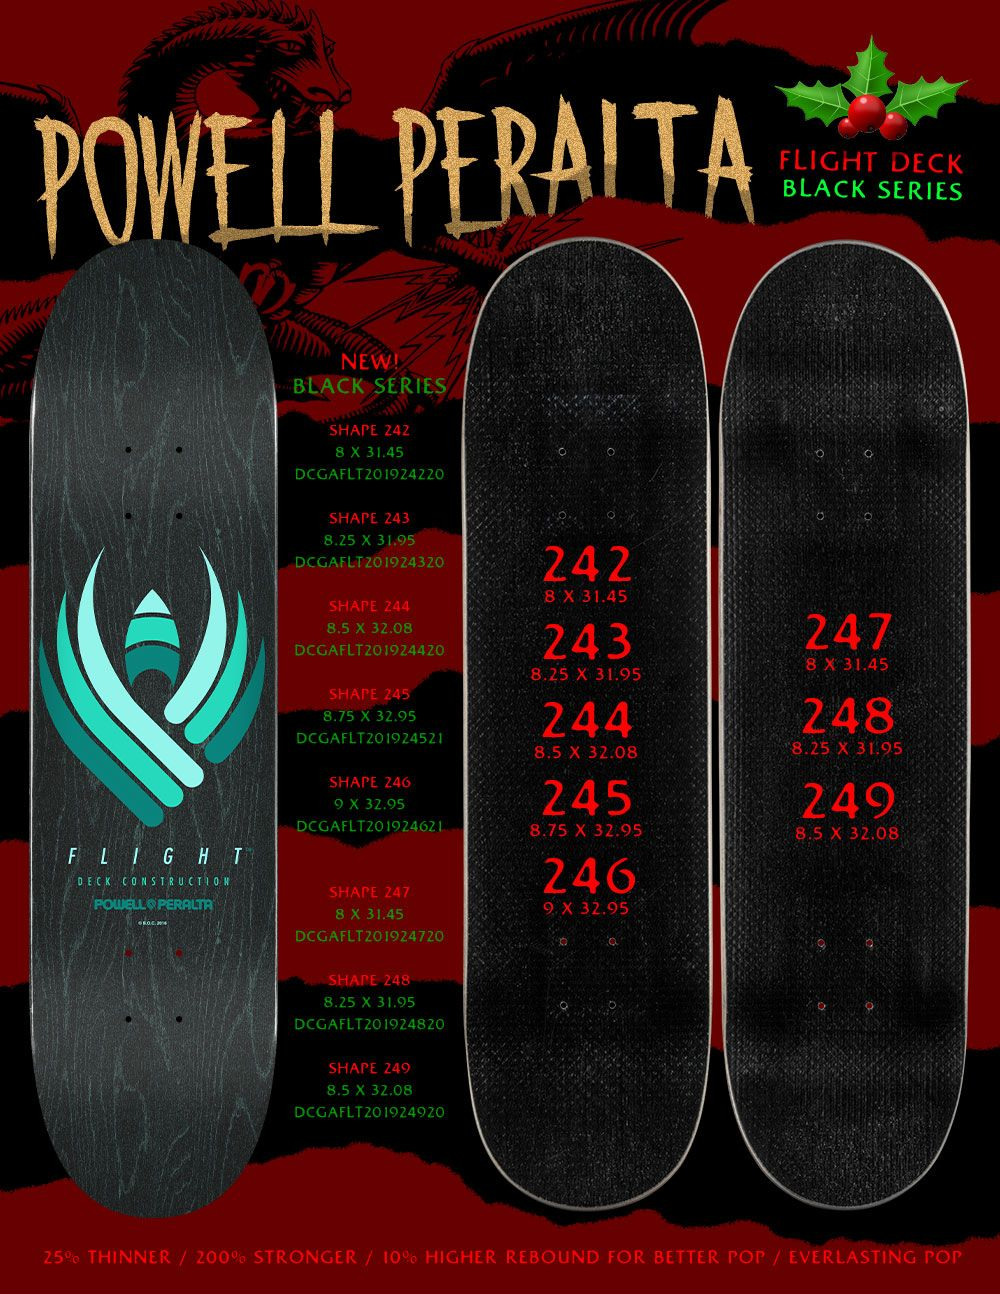 Powell Peralta Flight Deck Black Series Flight Deck Deck Powell Peralta